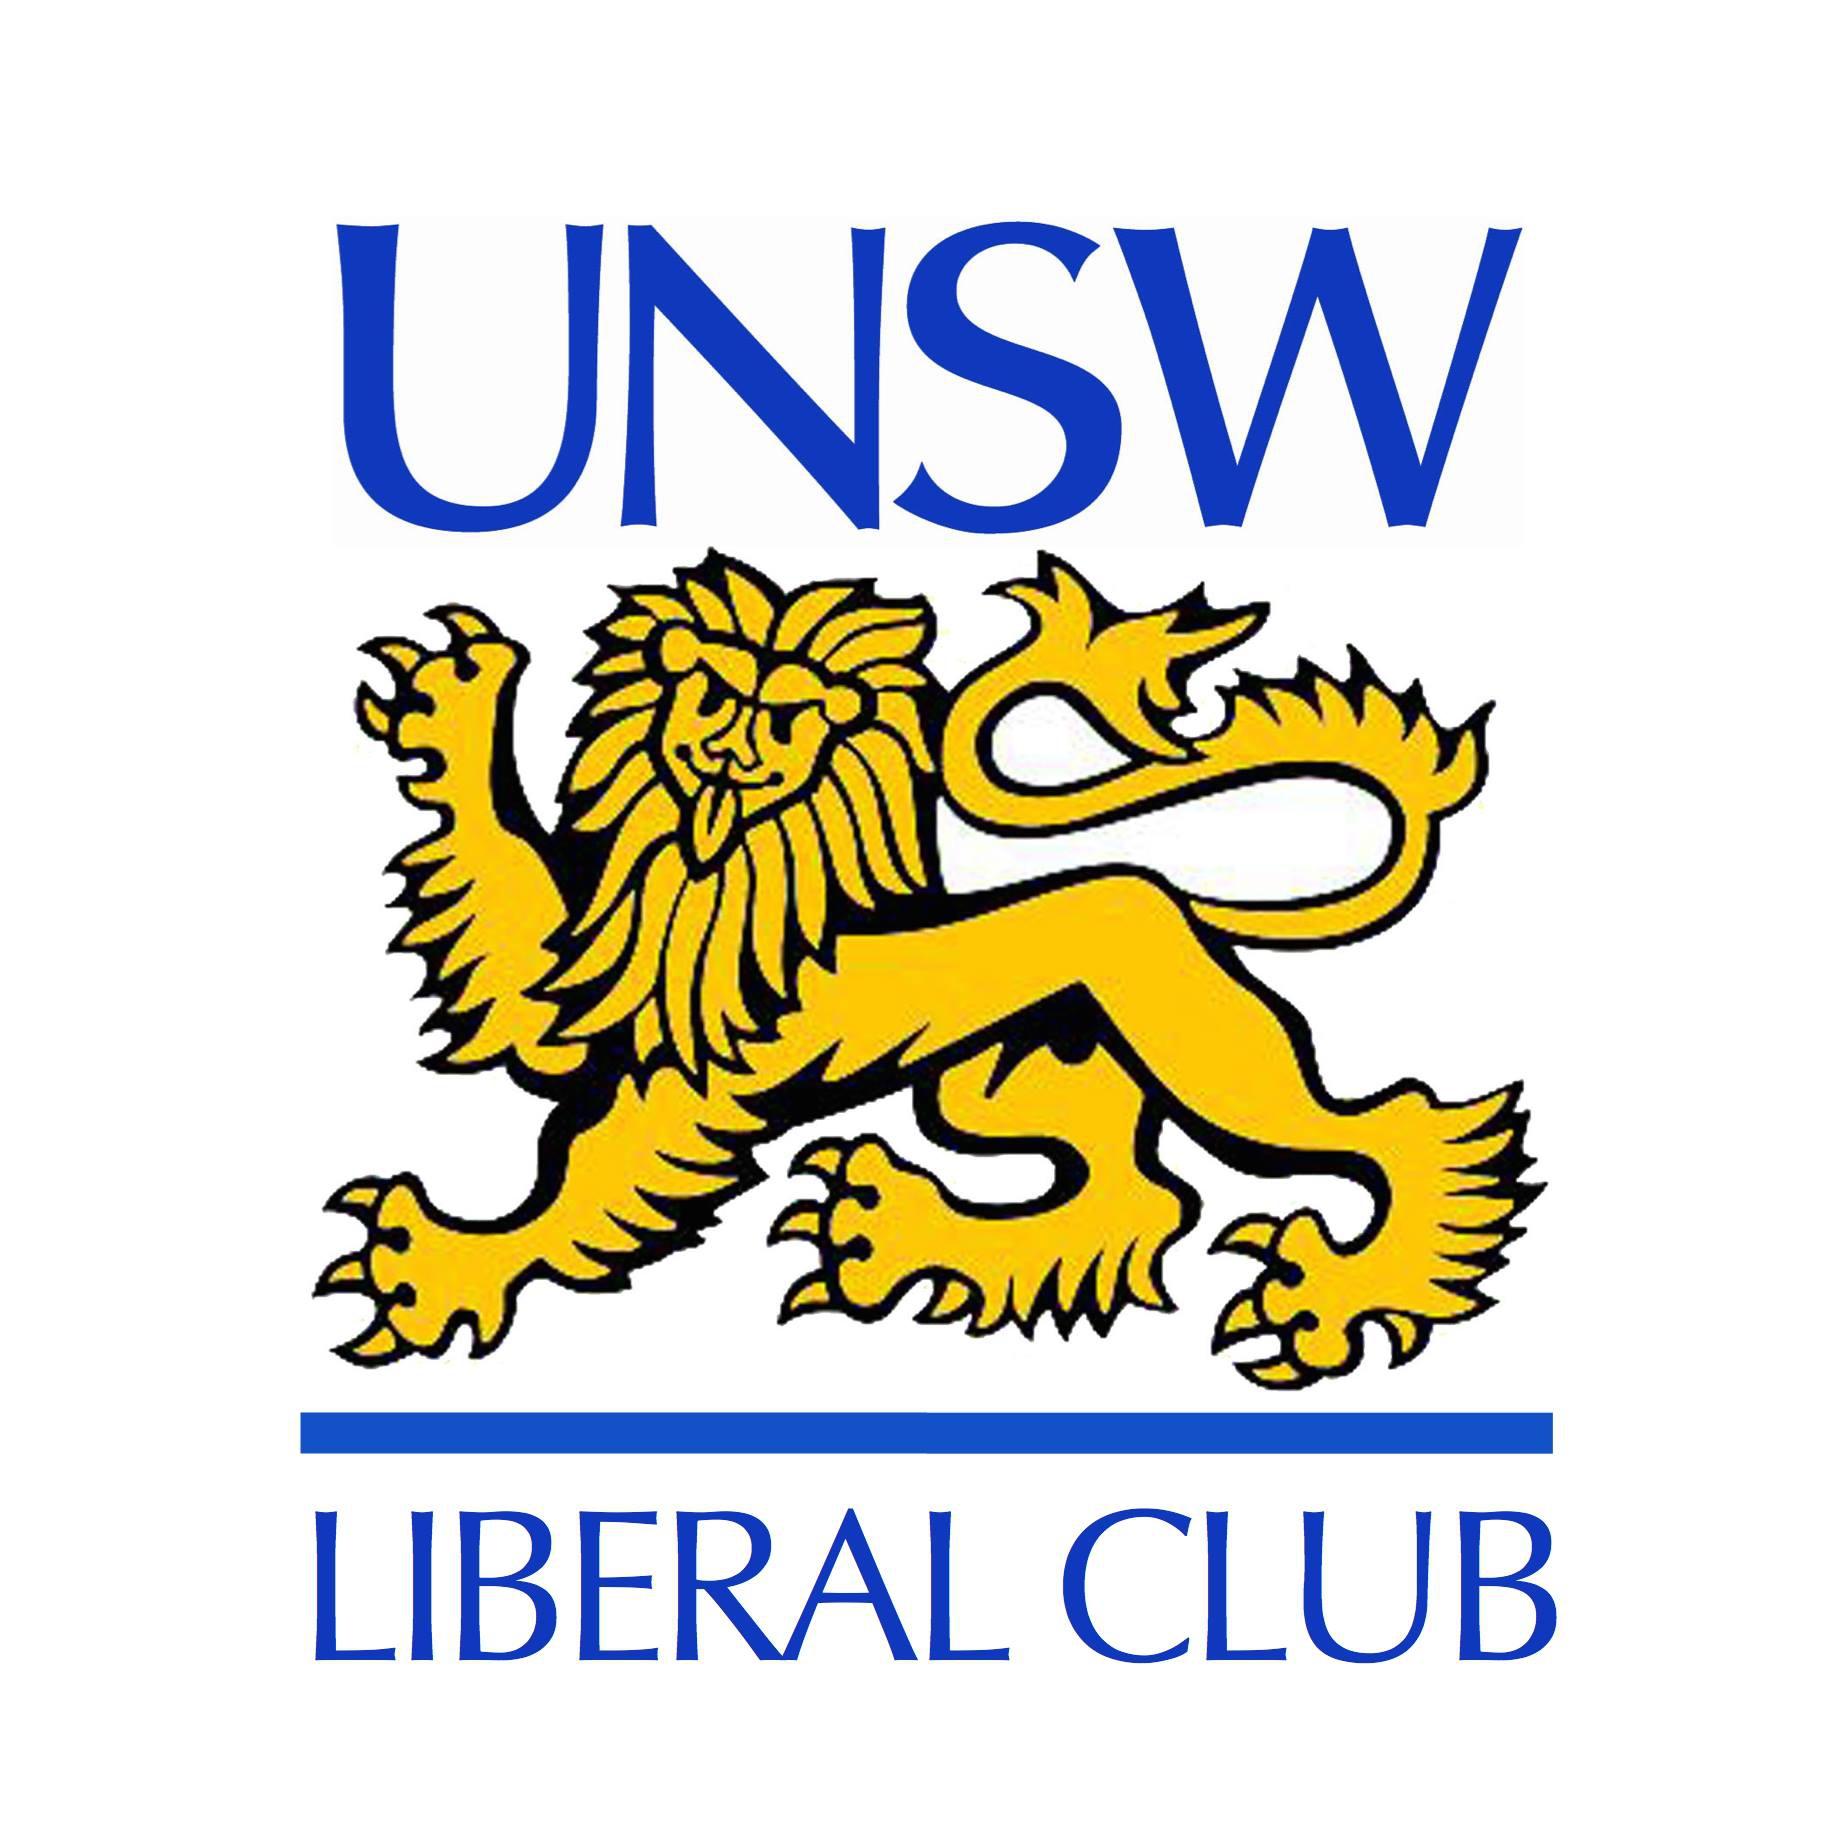 https://www.alsf.org.au/wp-content/uploads/2020/08/UNSW-LC.jpg